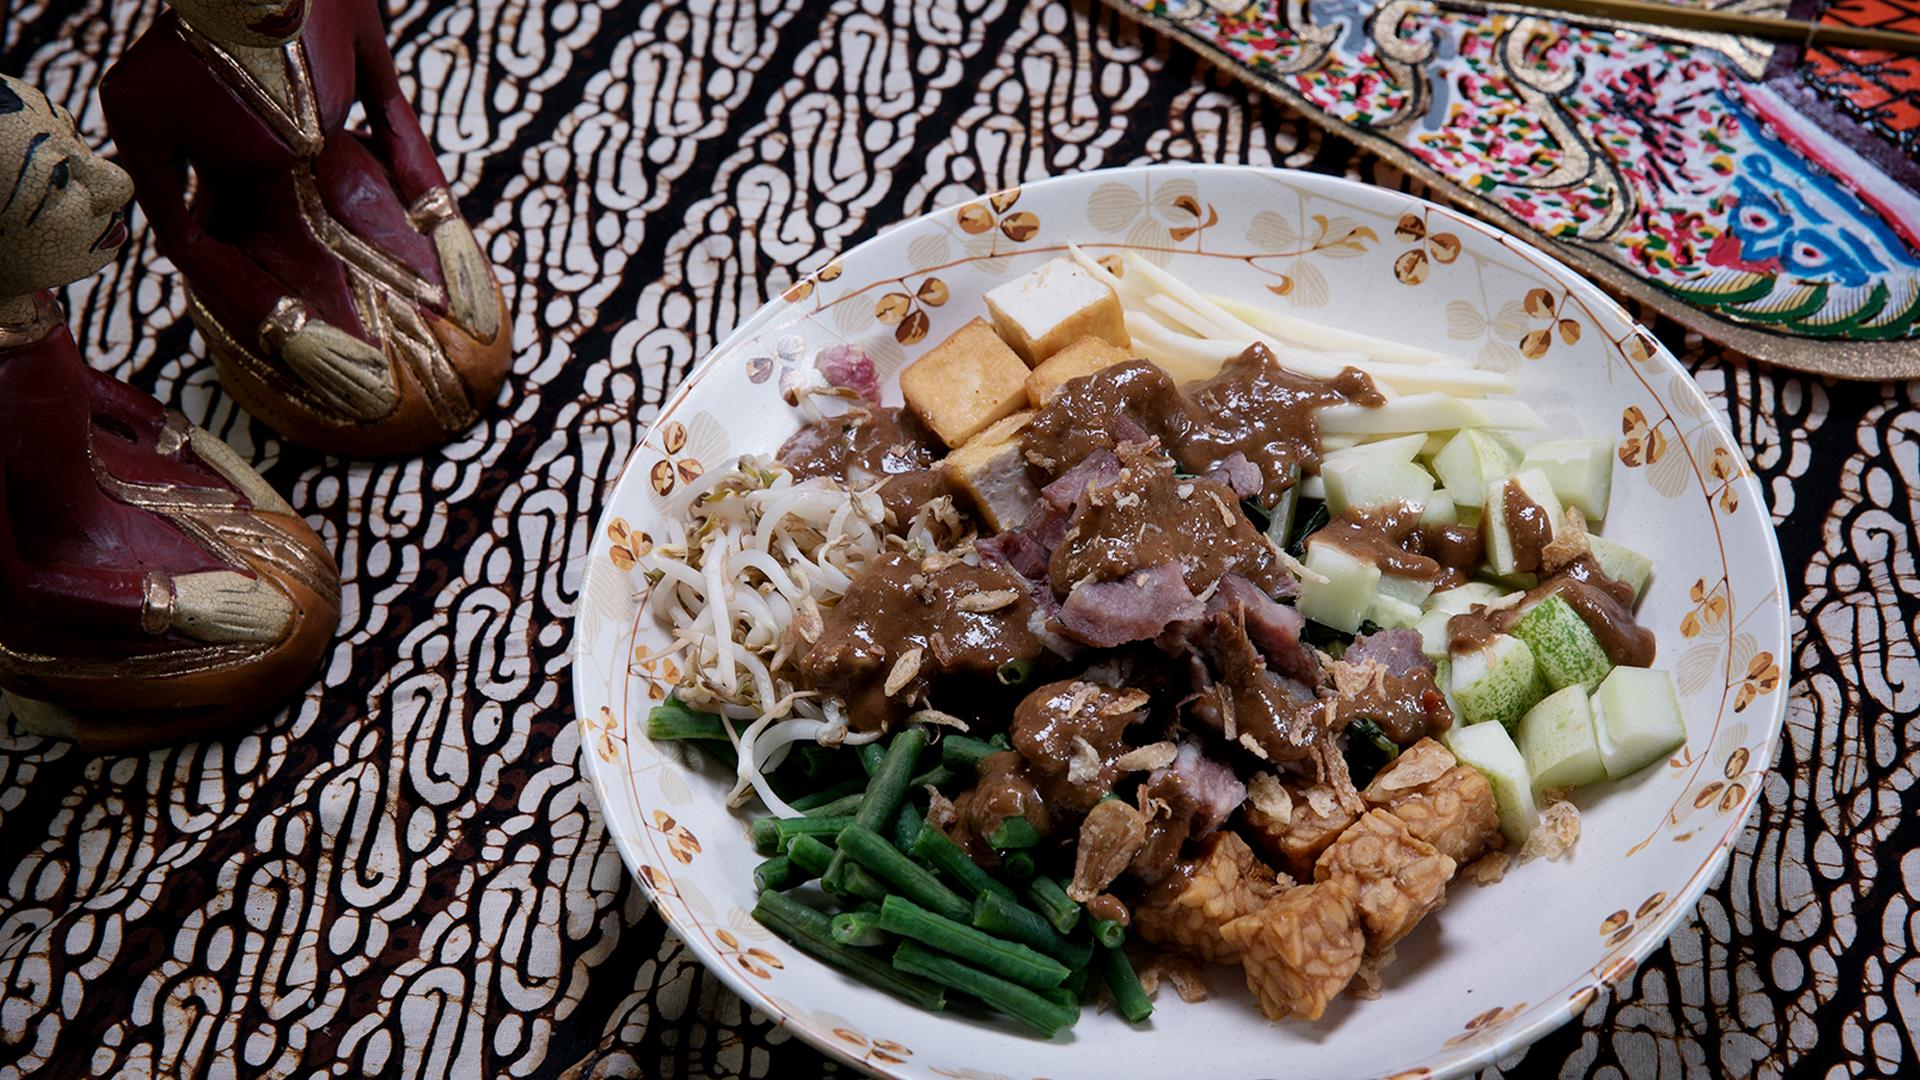 Rujak cingur, khasnya ada pada potongan moncong sapi di dalam hidangannya (foto: tastemade.com)